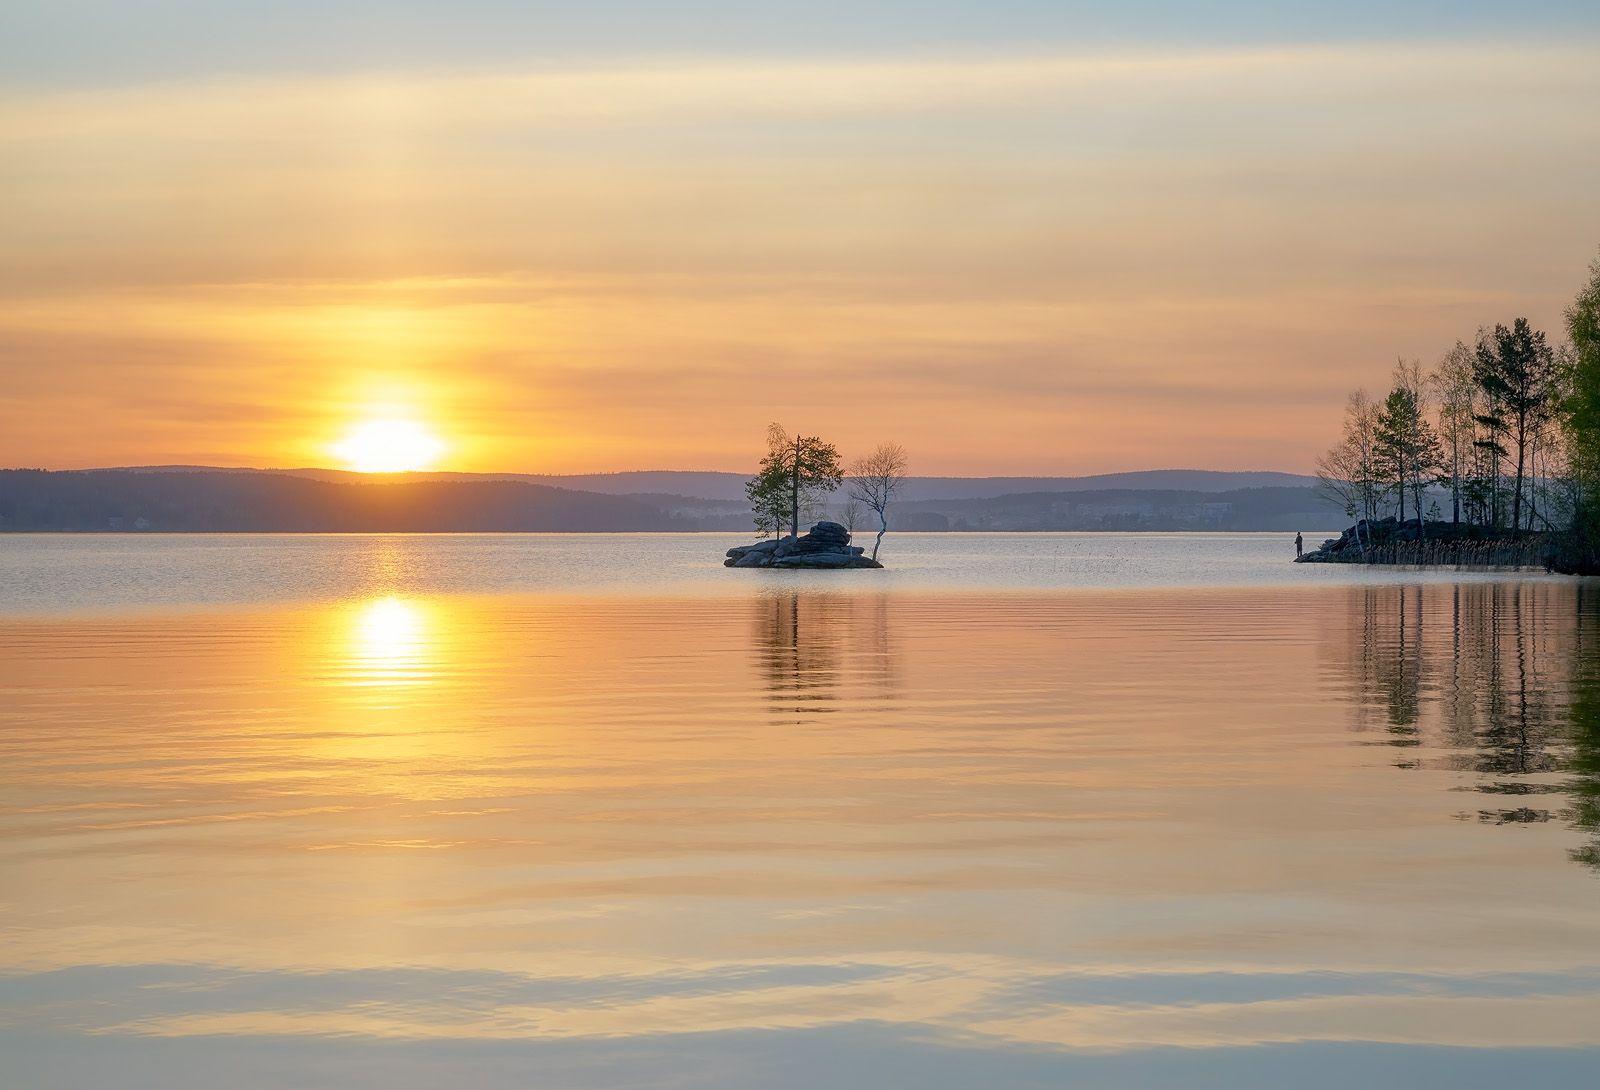 Тишь, да гладь ... закат солнце урал таватуй вода озеро остров